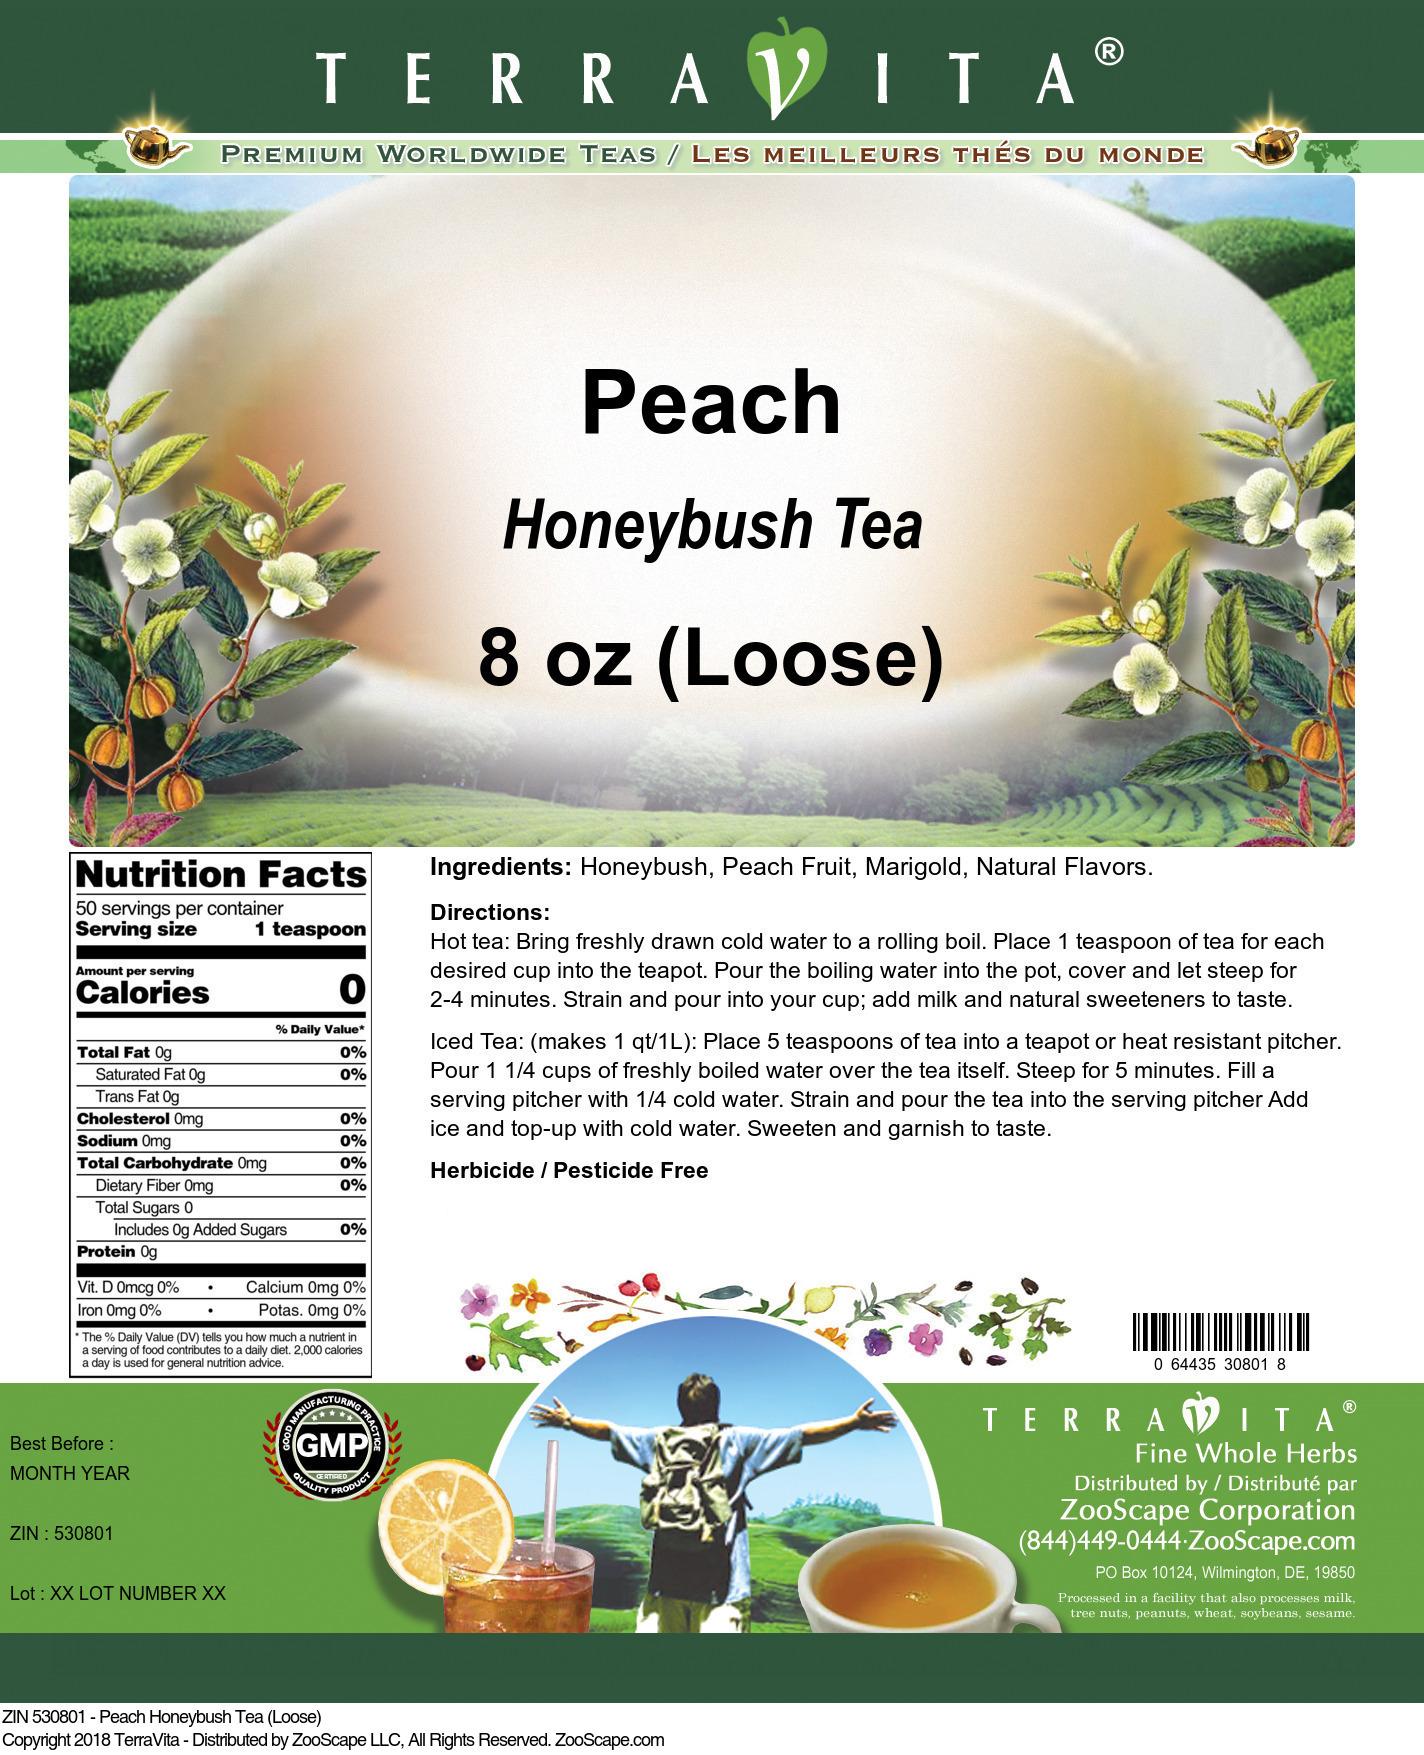 Peach Honeybush Tea (Loose)